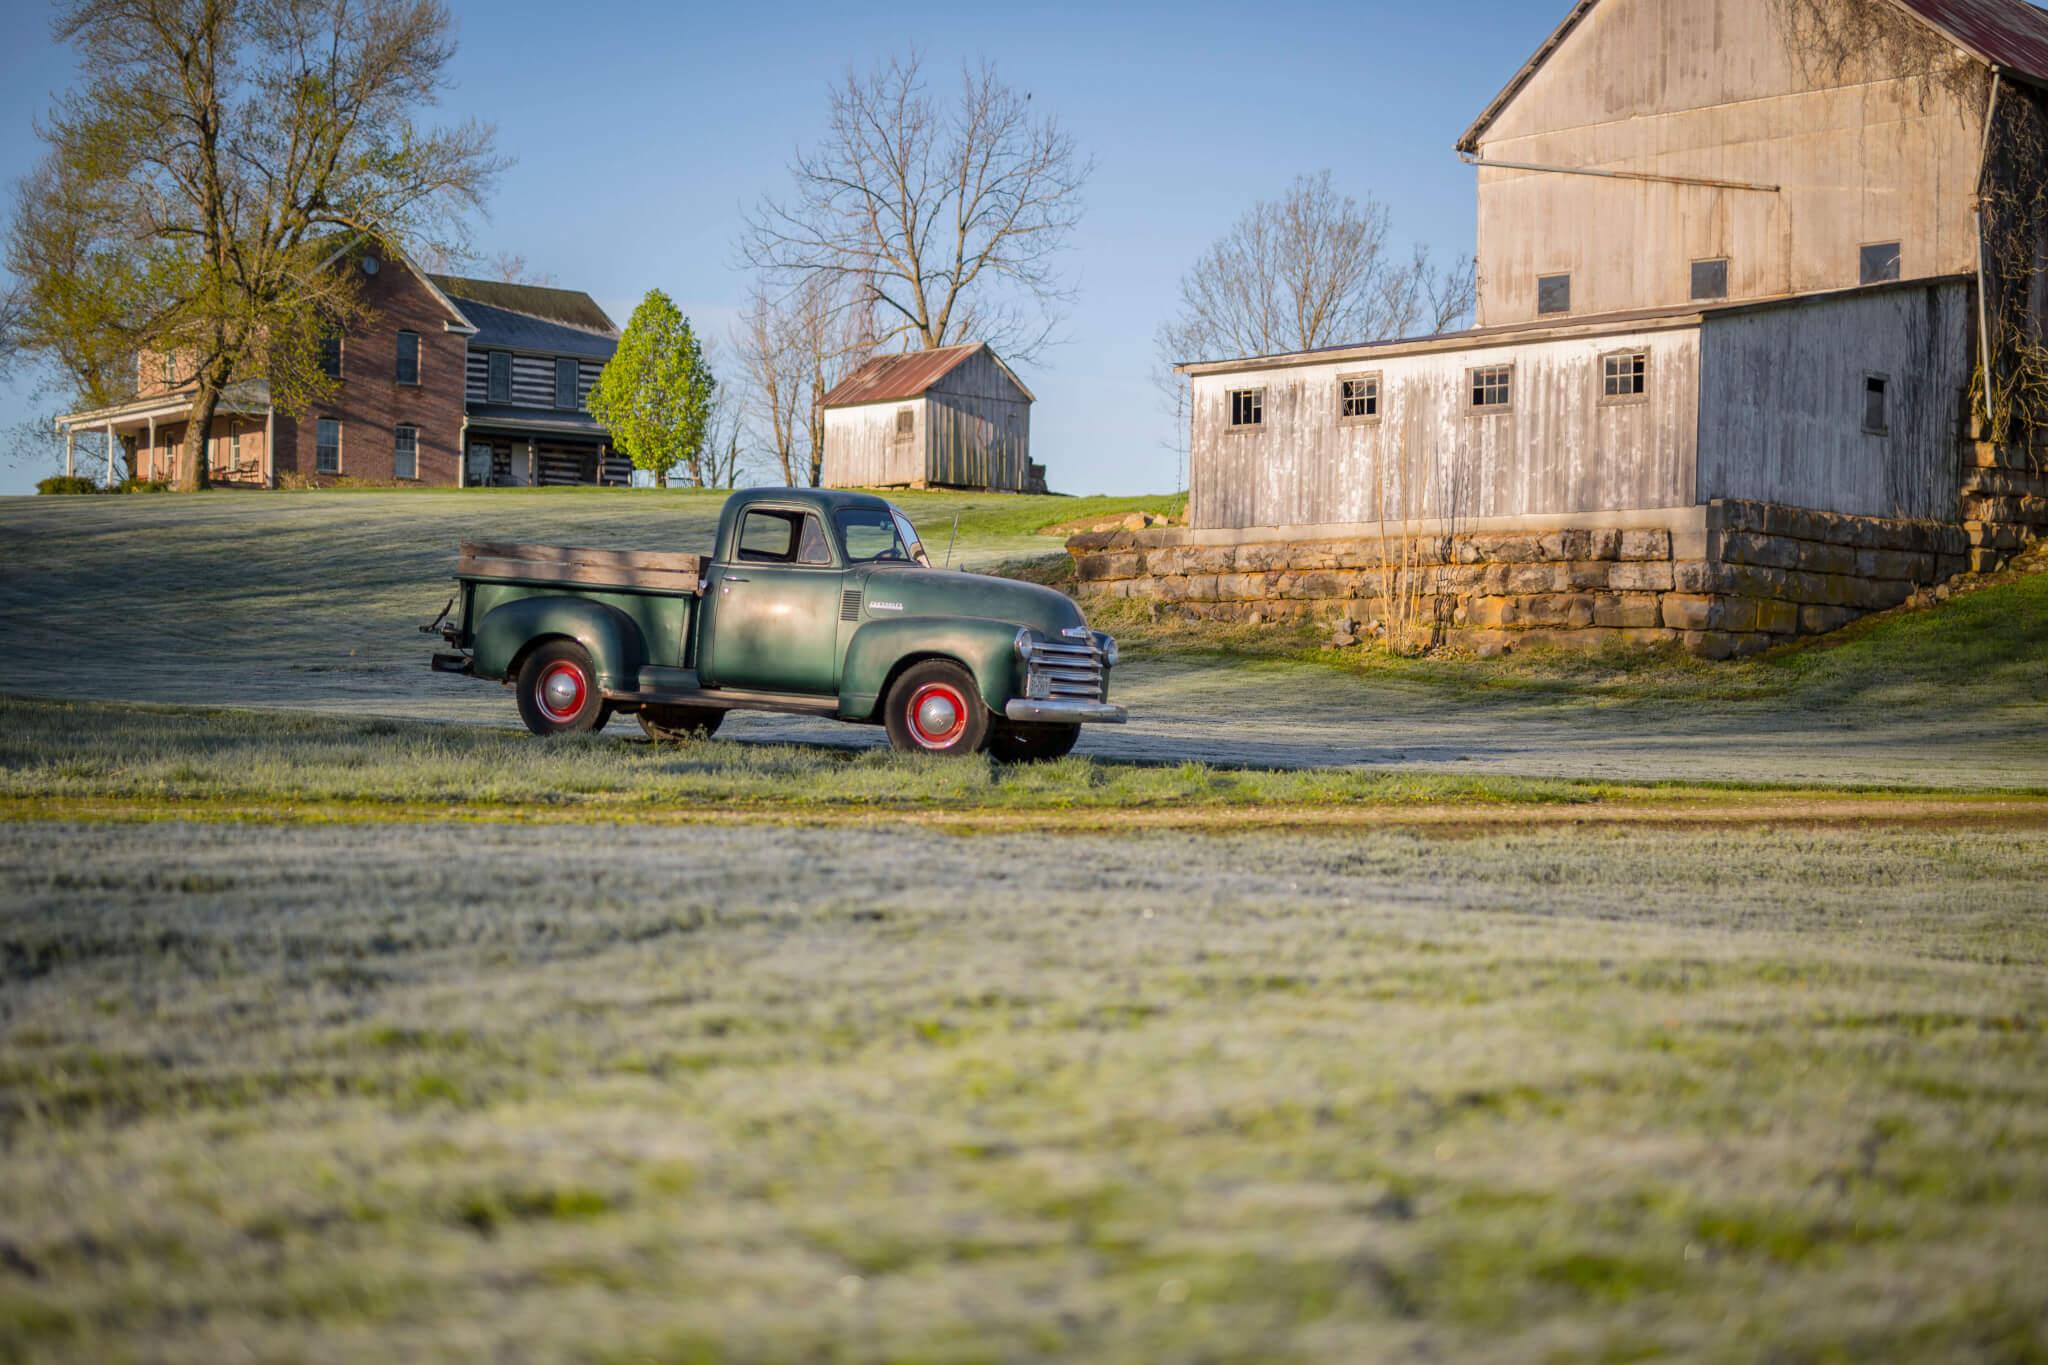 1951 Chevy 3100 Rodney Adams Lmc Truck Life Pickup An Error Occurred